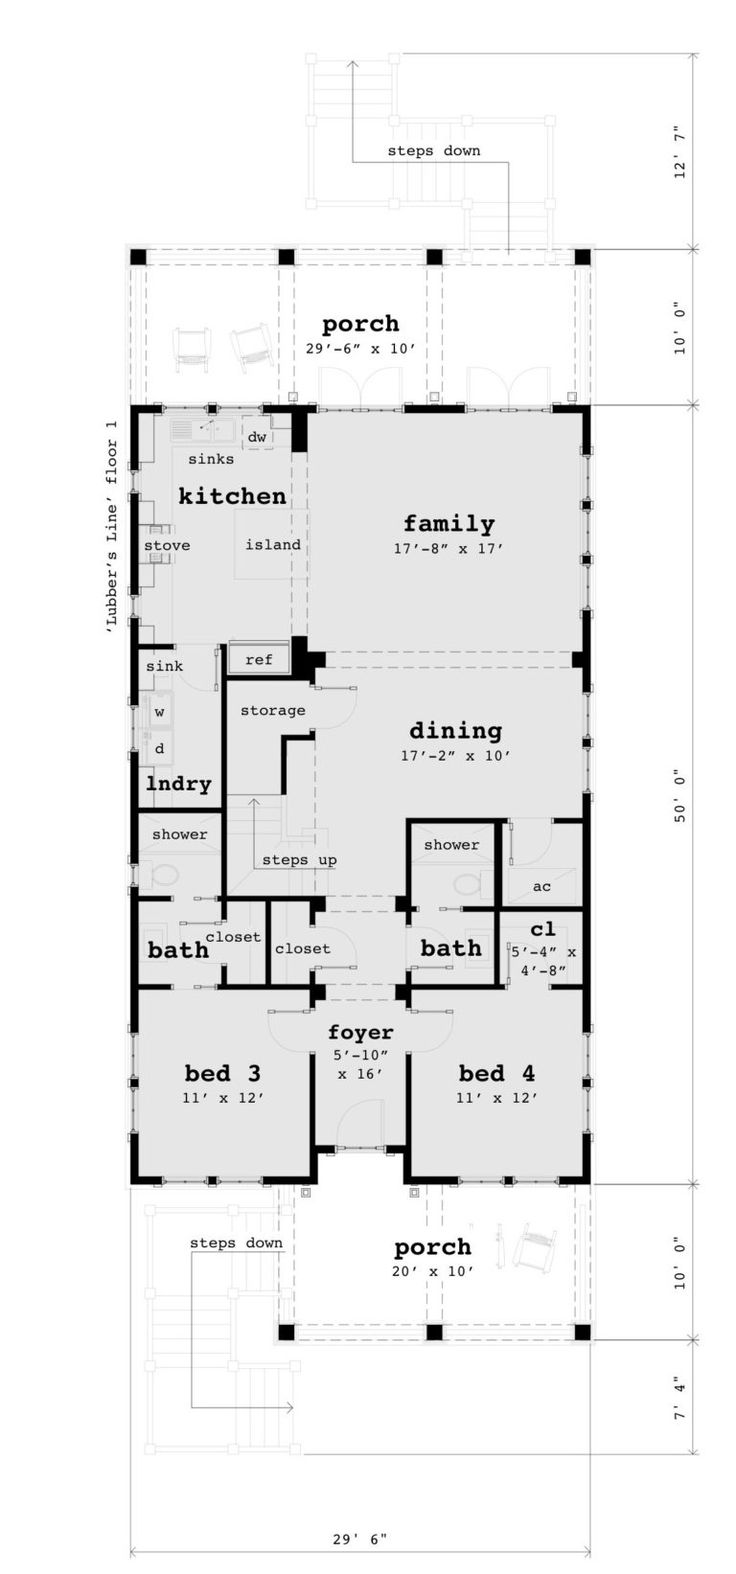 4 Bedroom Beach House Plan in 2020 Beach house plans